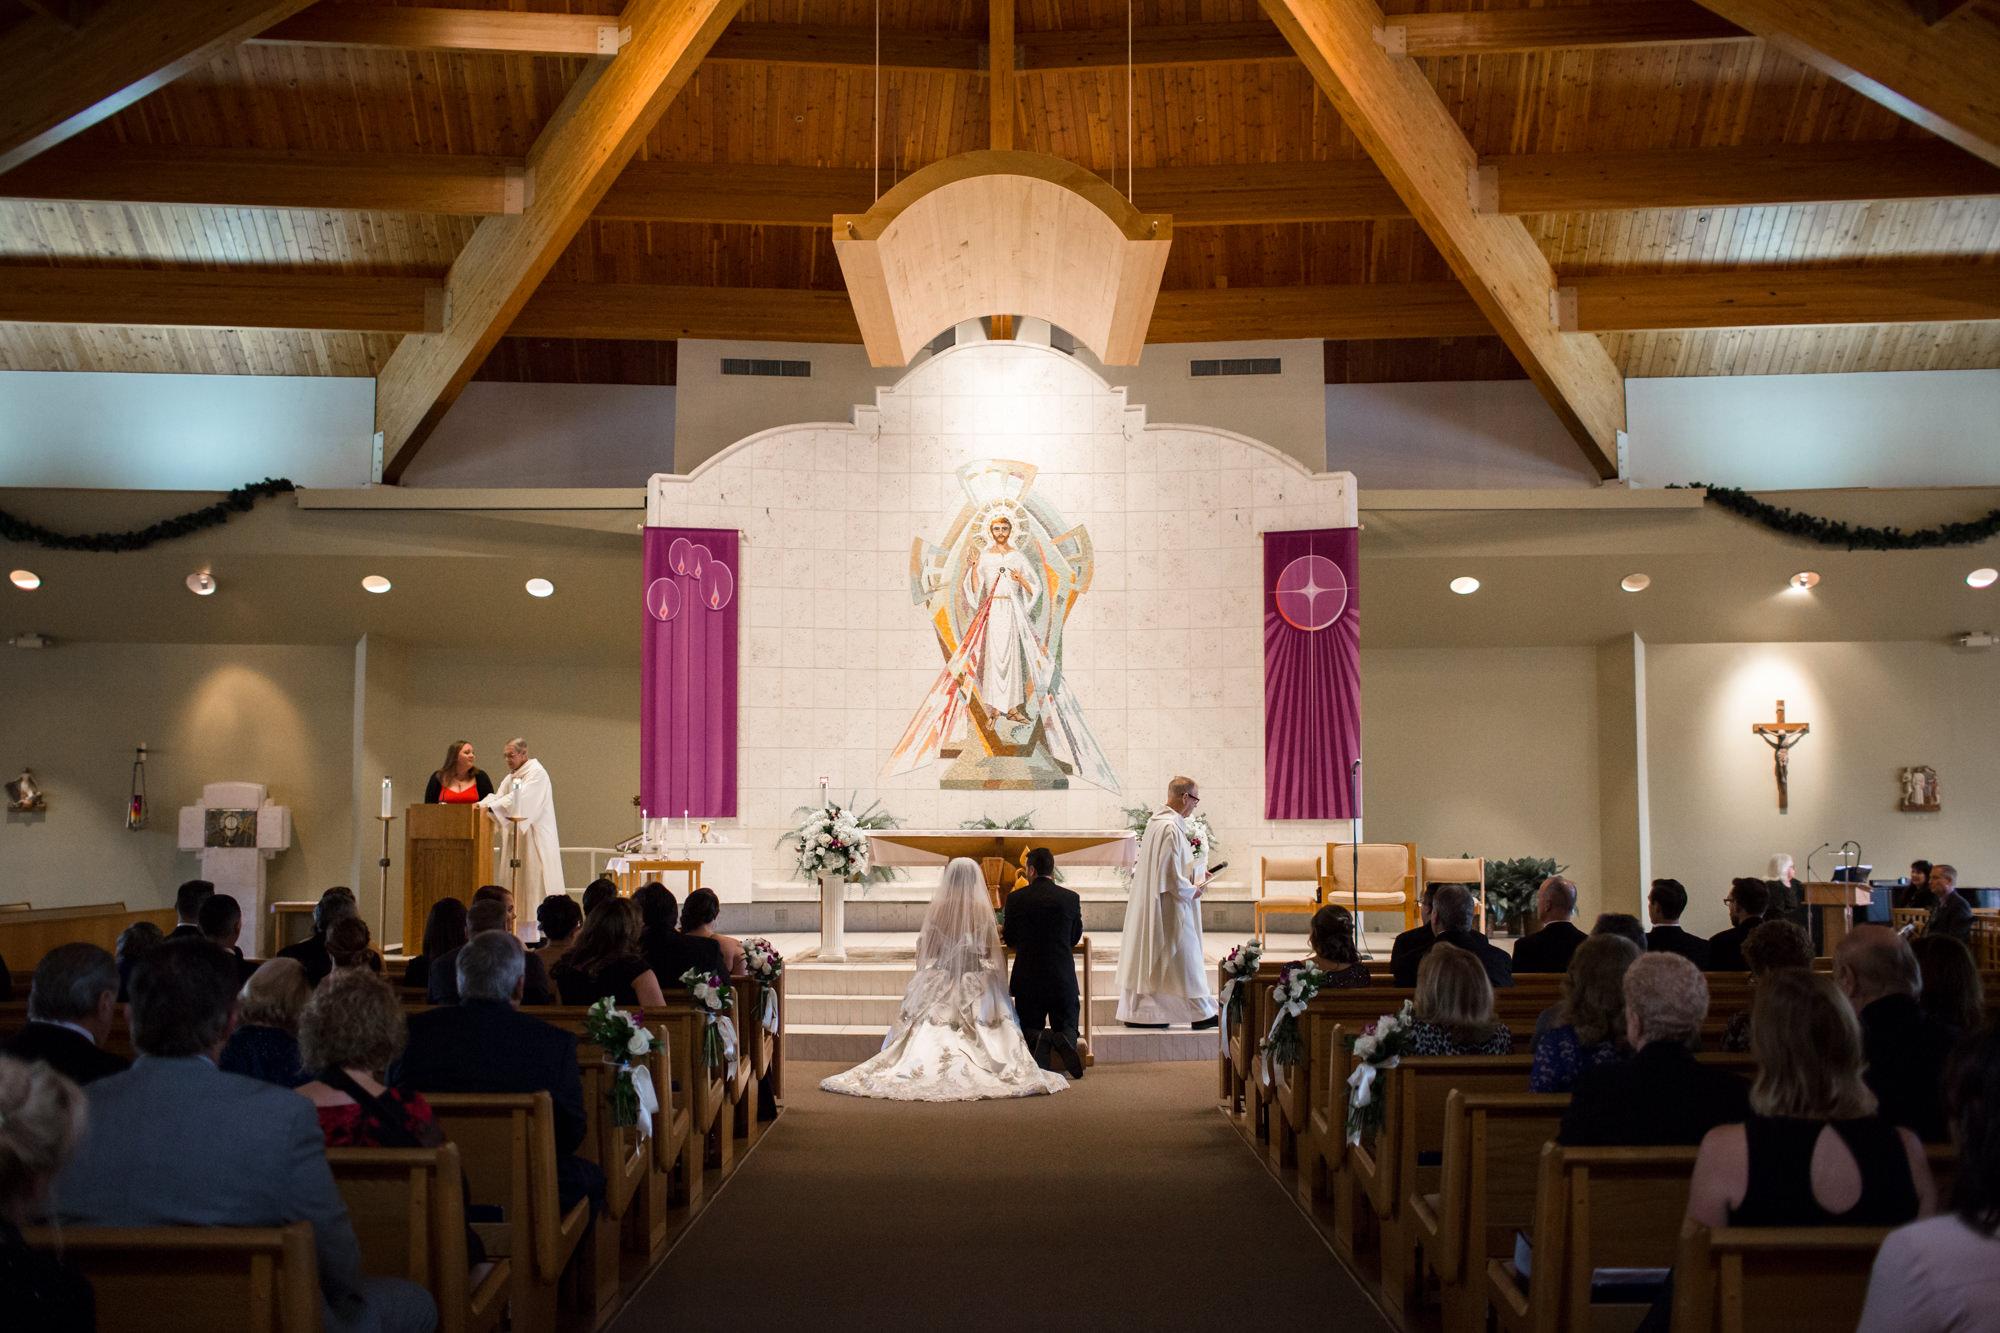 Benvenuto_Wedding_catholic_Florida_Bride-Groom-45.jpg